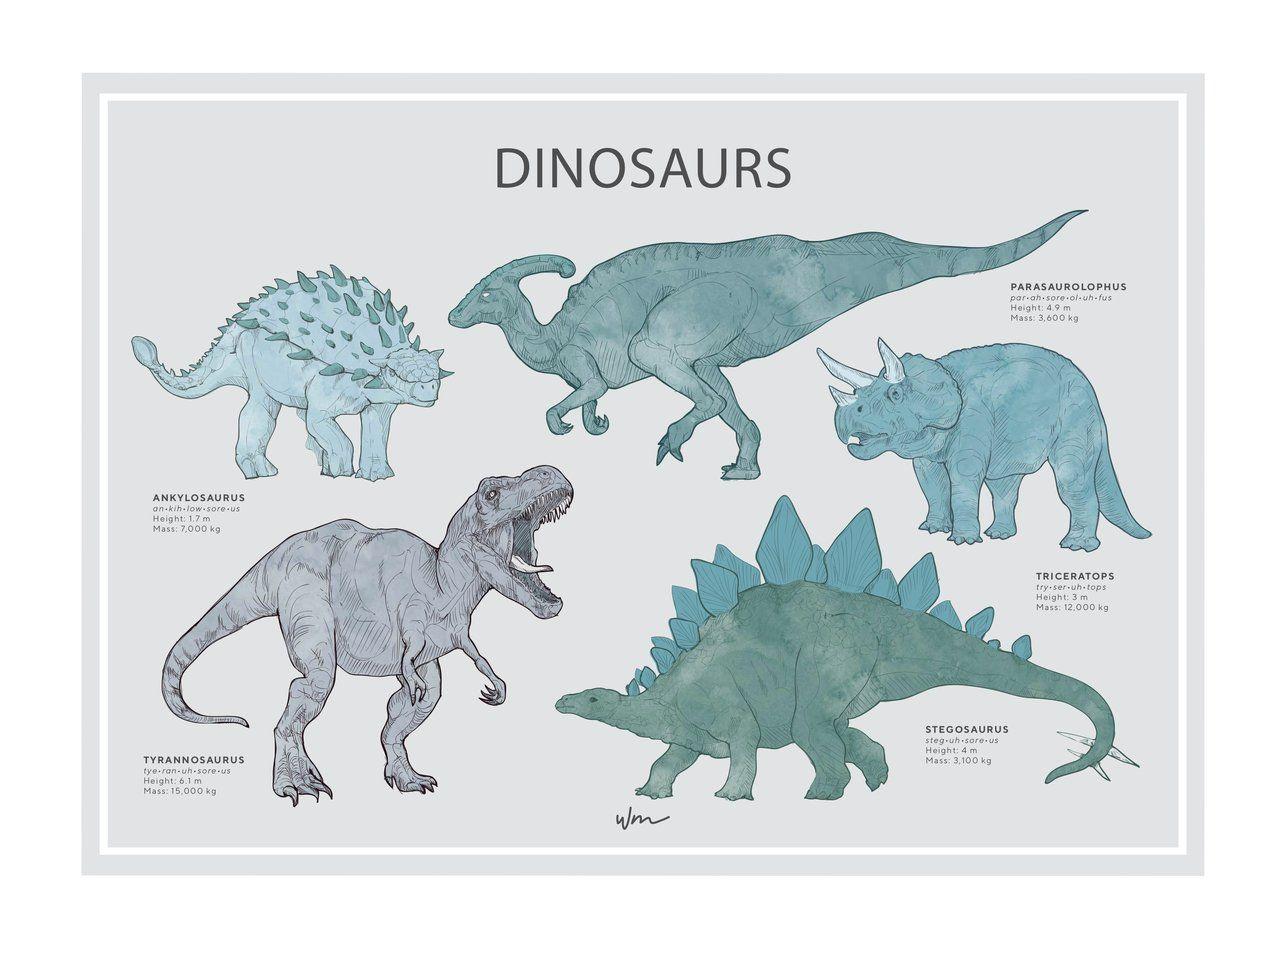 Dinosaur Watercolour Poster Decal Minimalist In 2020 Dinosaur